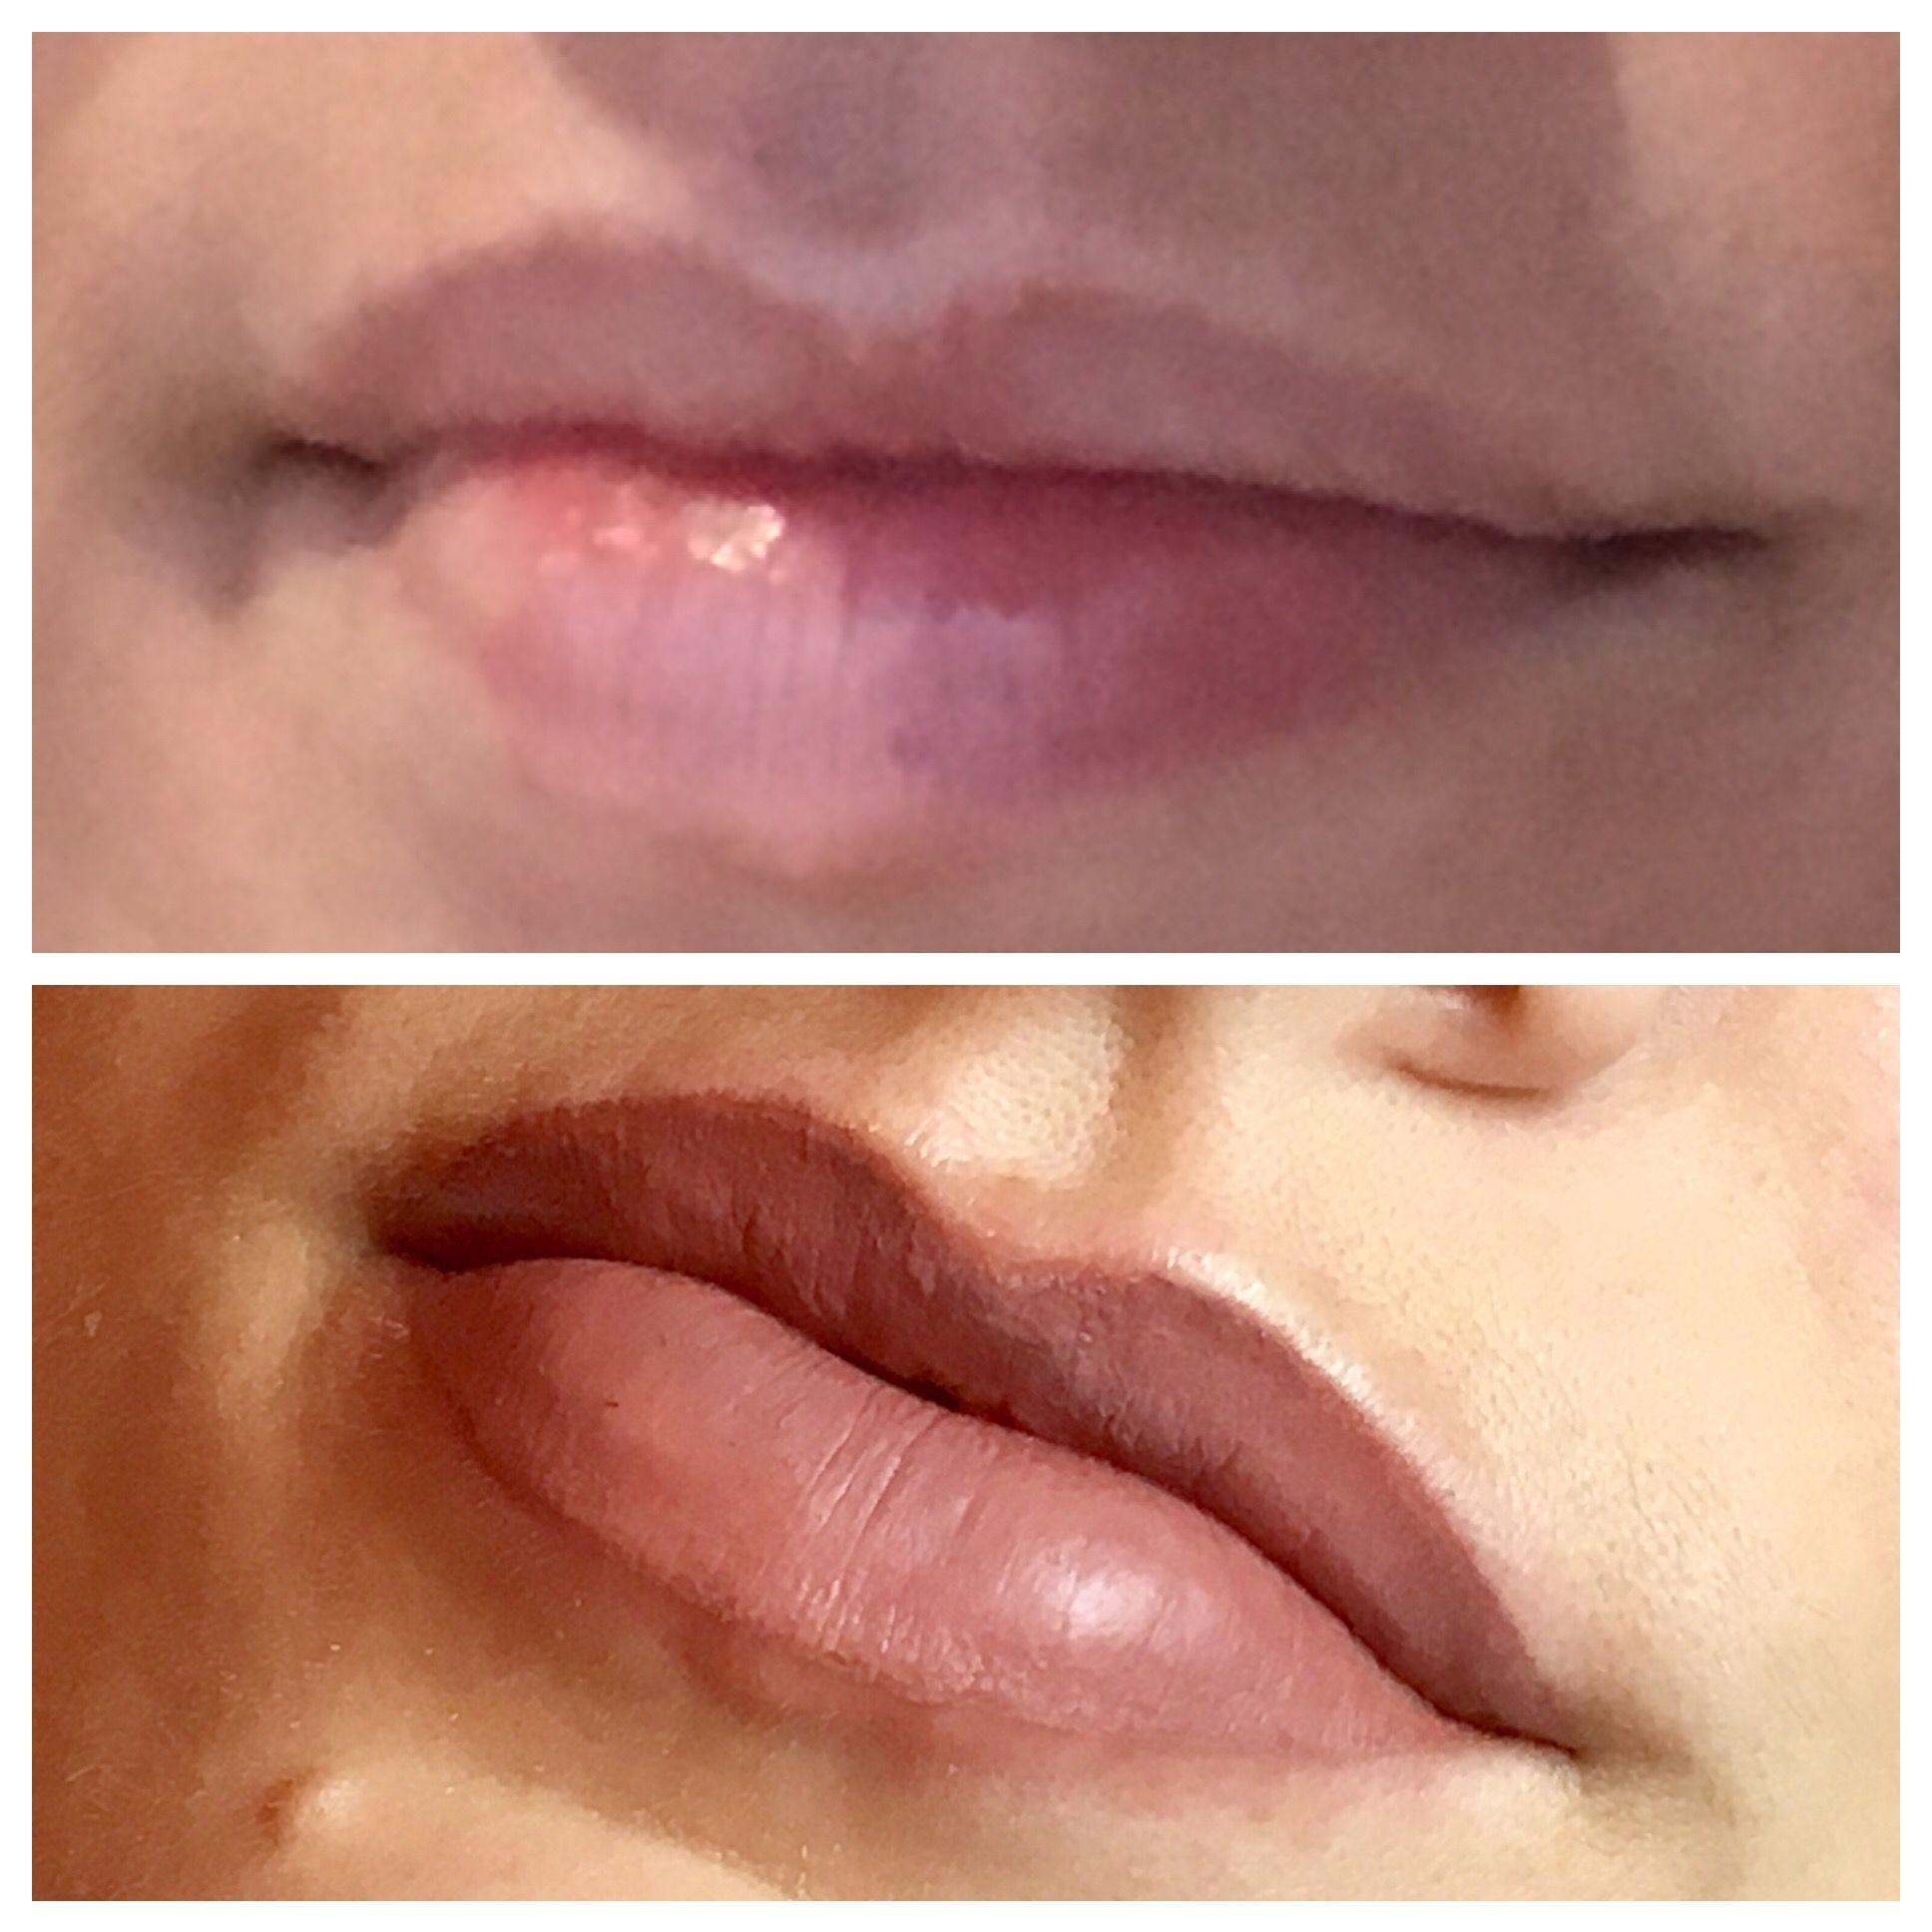 Nose piercing gun vs needle  Pin by Sarah Catherine Cosmetics on Lips  Pinterest  Lips